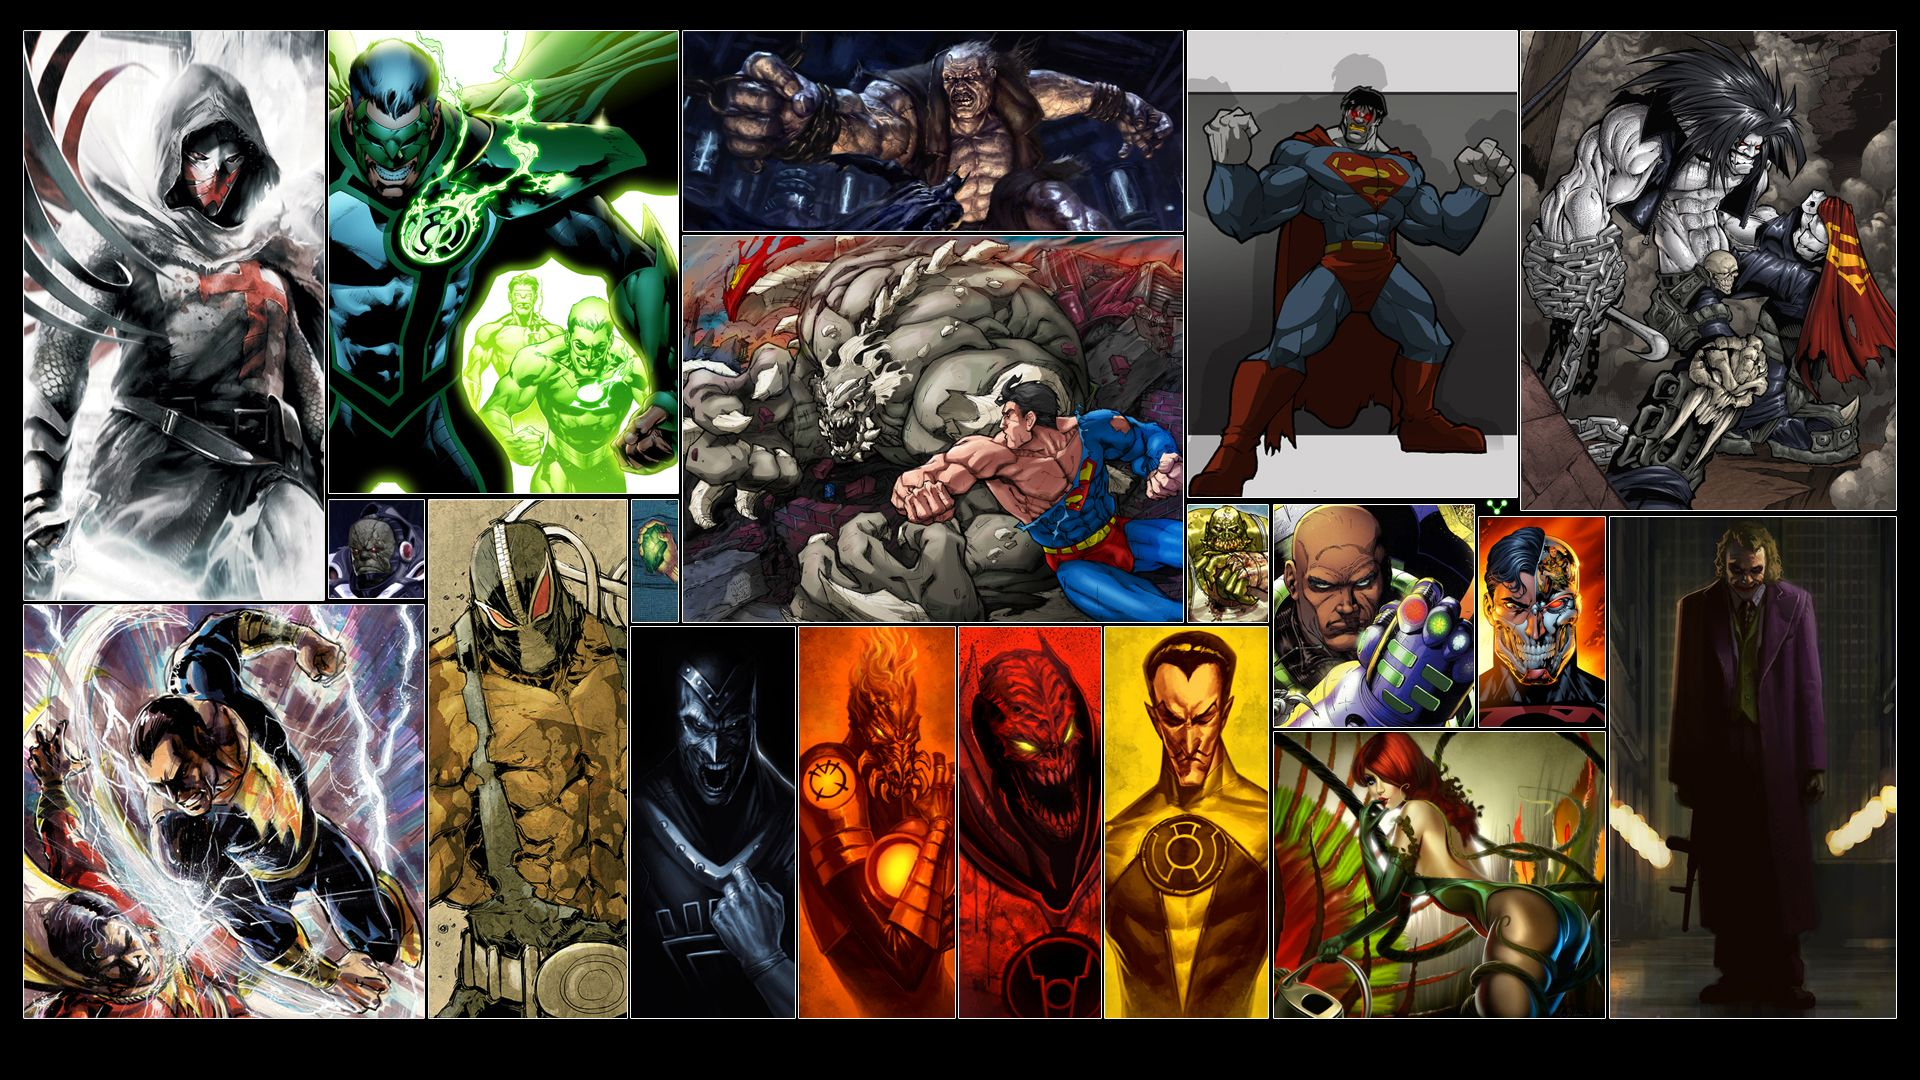 Dc Comics Super Villains Computer Wallpapers Desktop Backgrounds 1920x1080 Id 546151 Comics Dc Villains Comic Villains